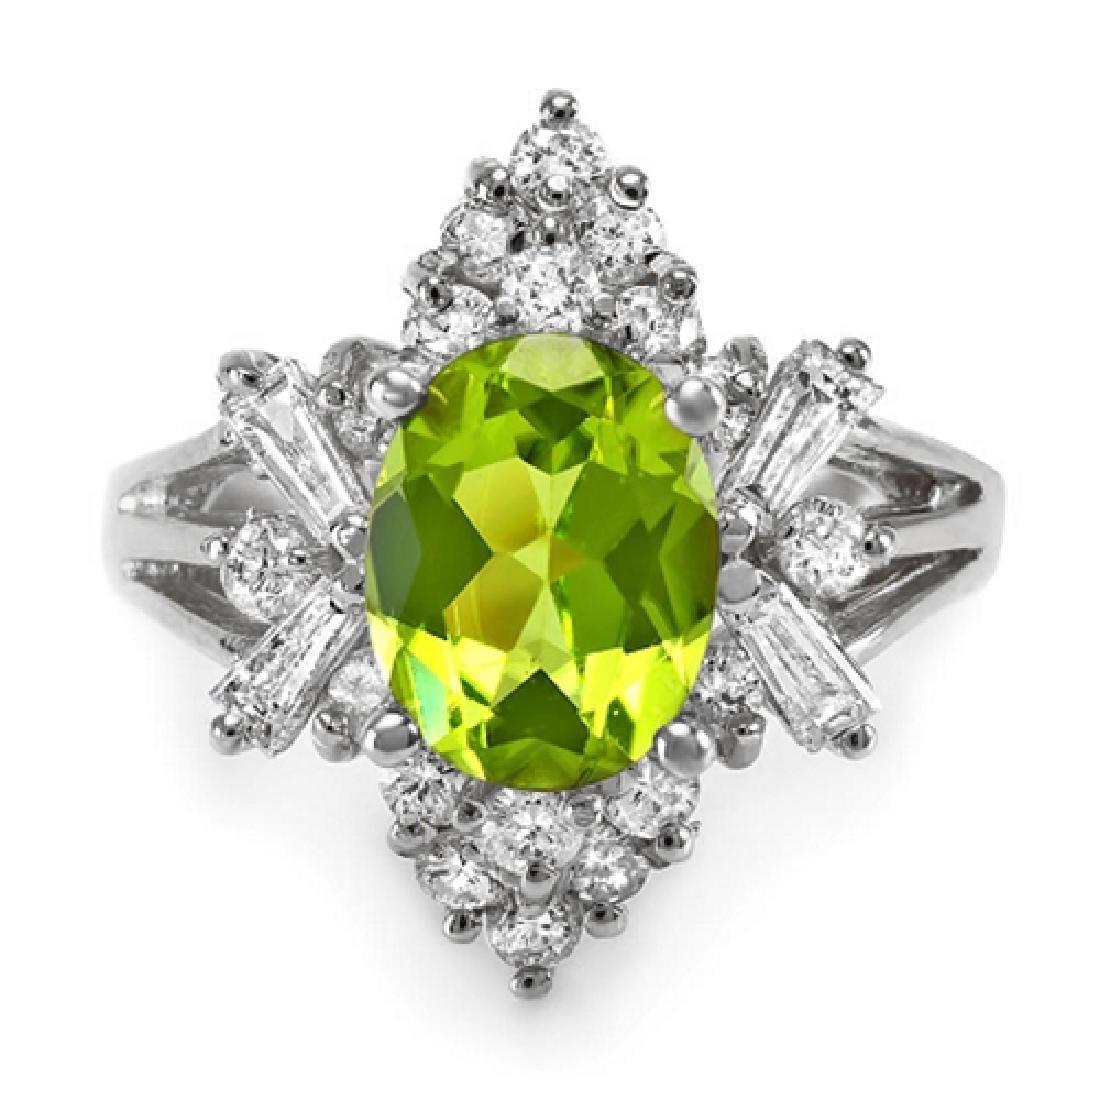 2.80Carat Natural Peridot 18K Solid White Gold Diamond